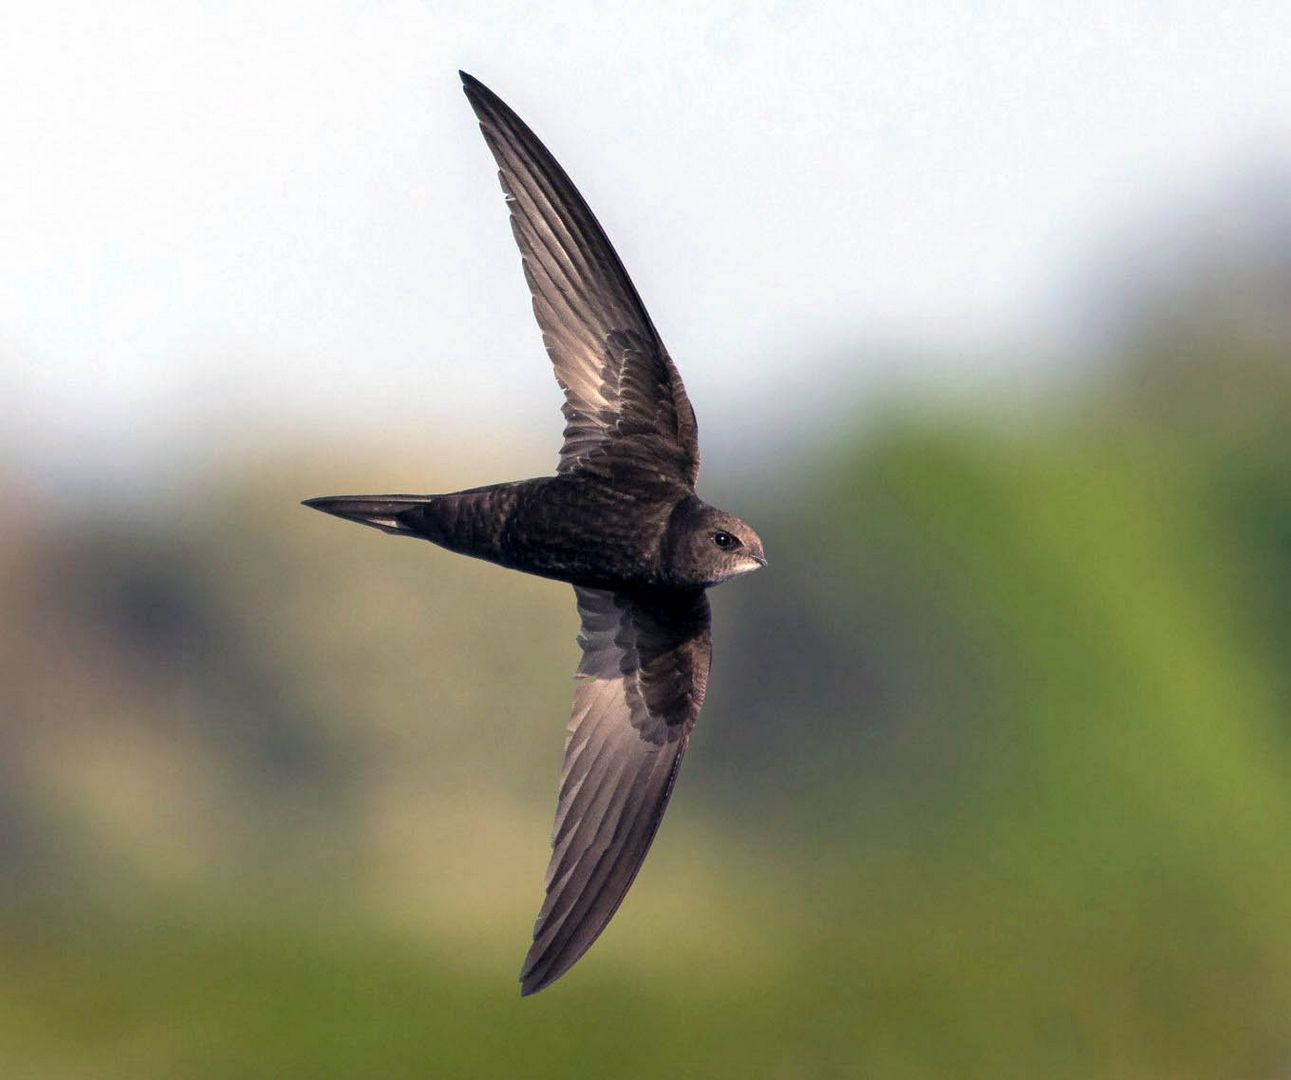 Фото стрижей птицы